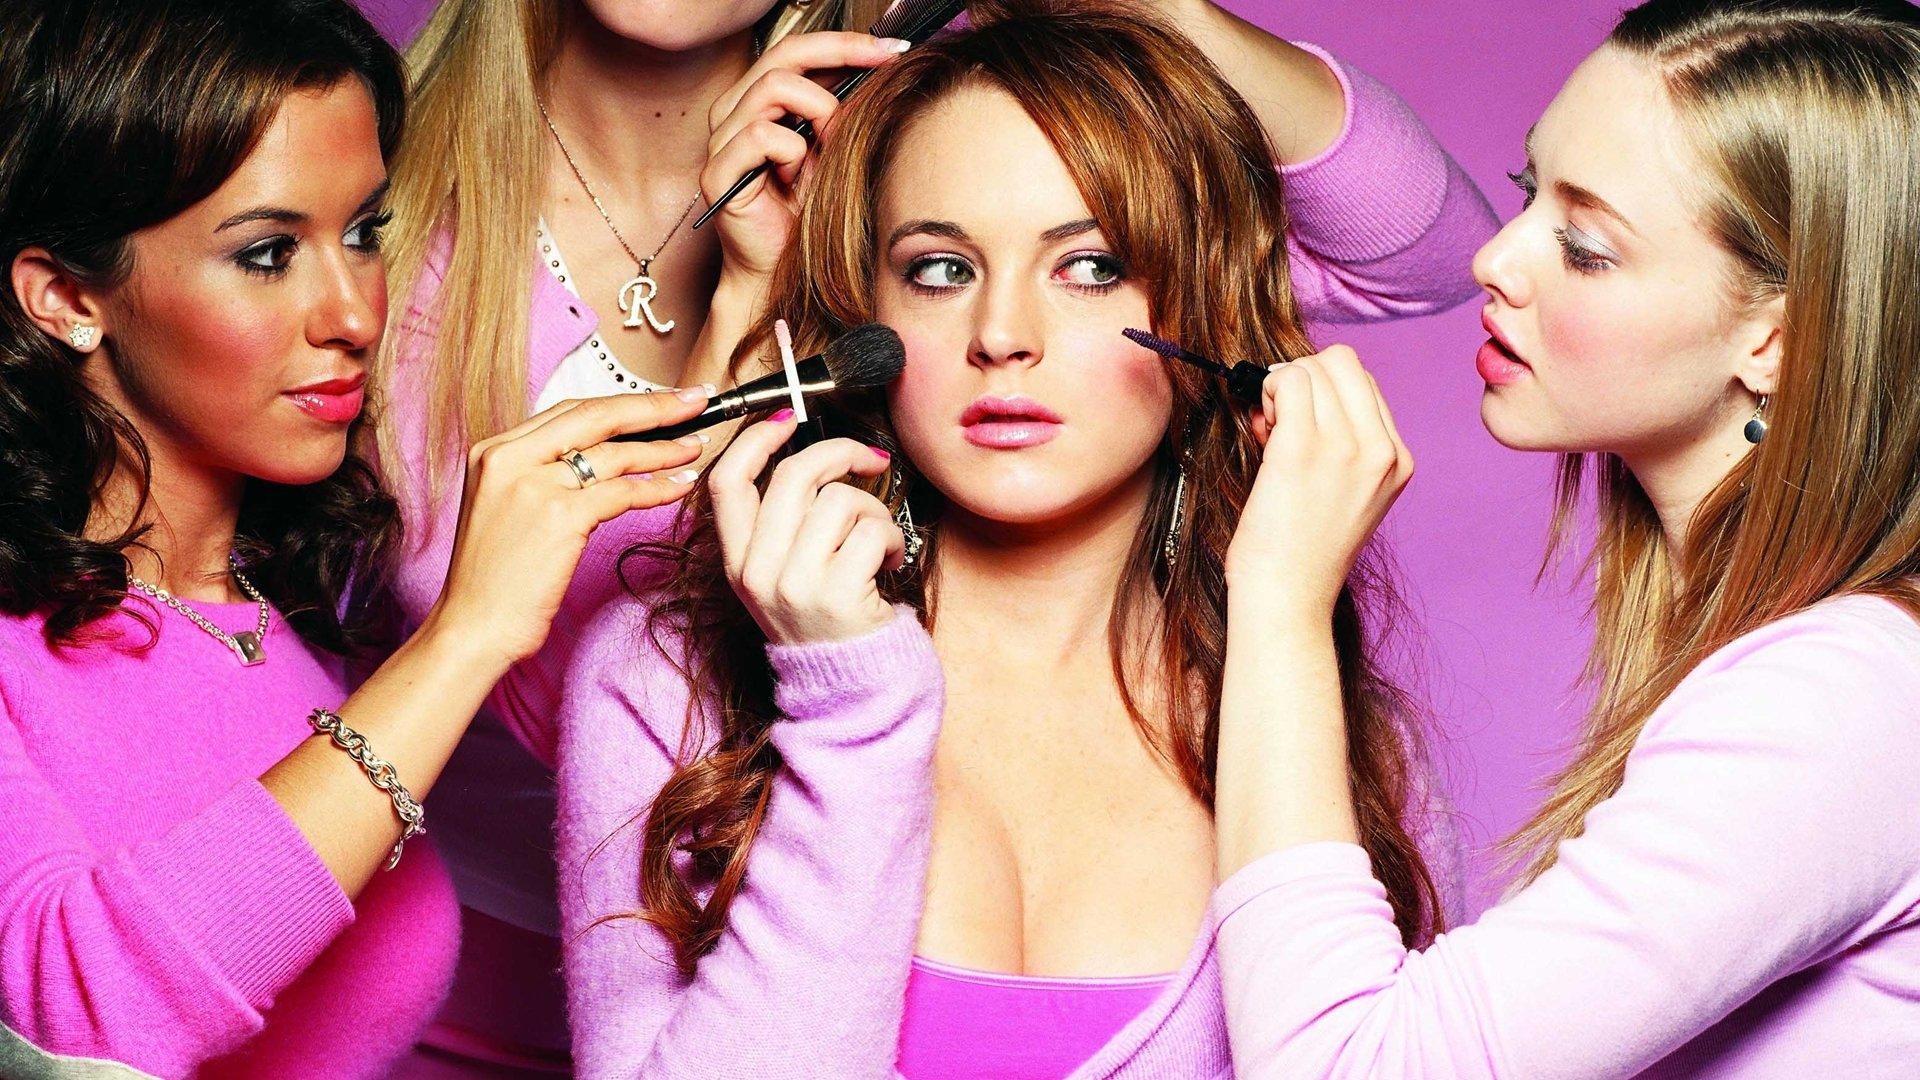 Celebrity - Lindsay Lohan  Wallpaper